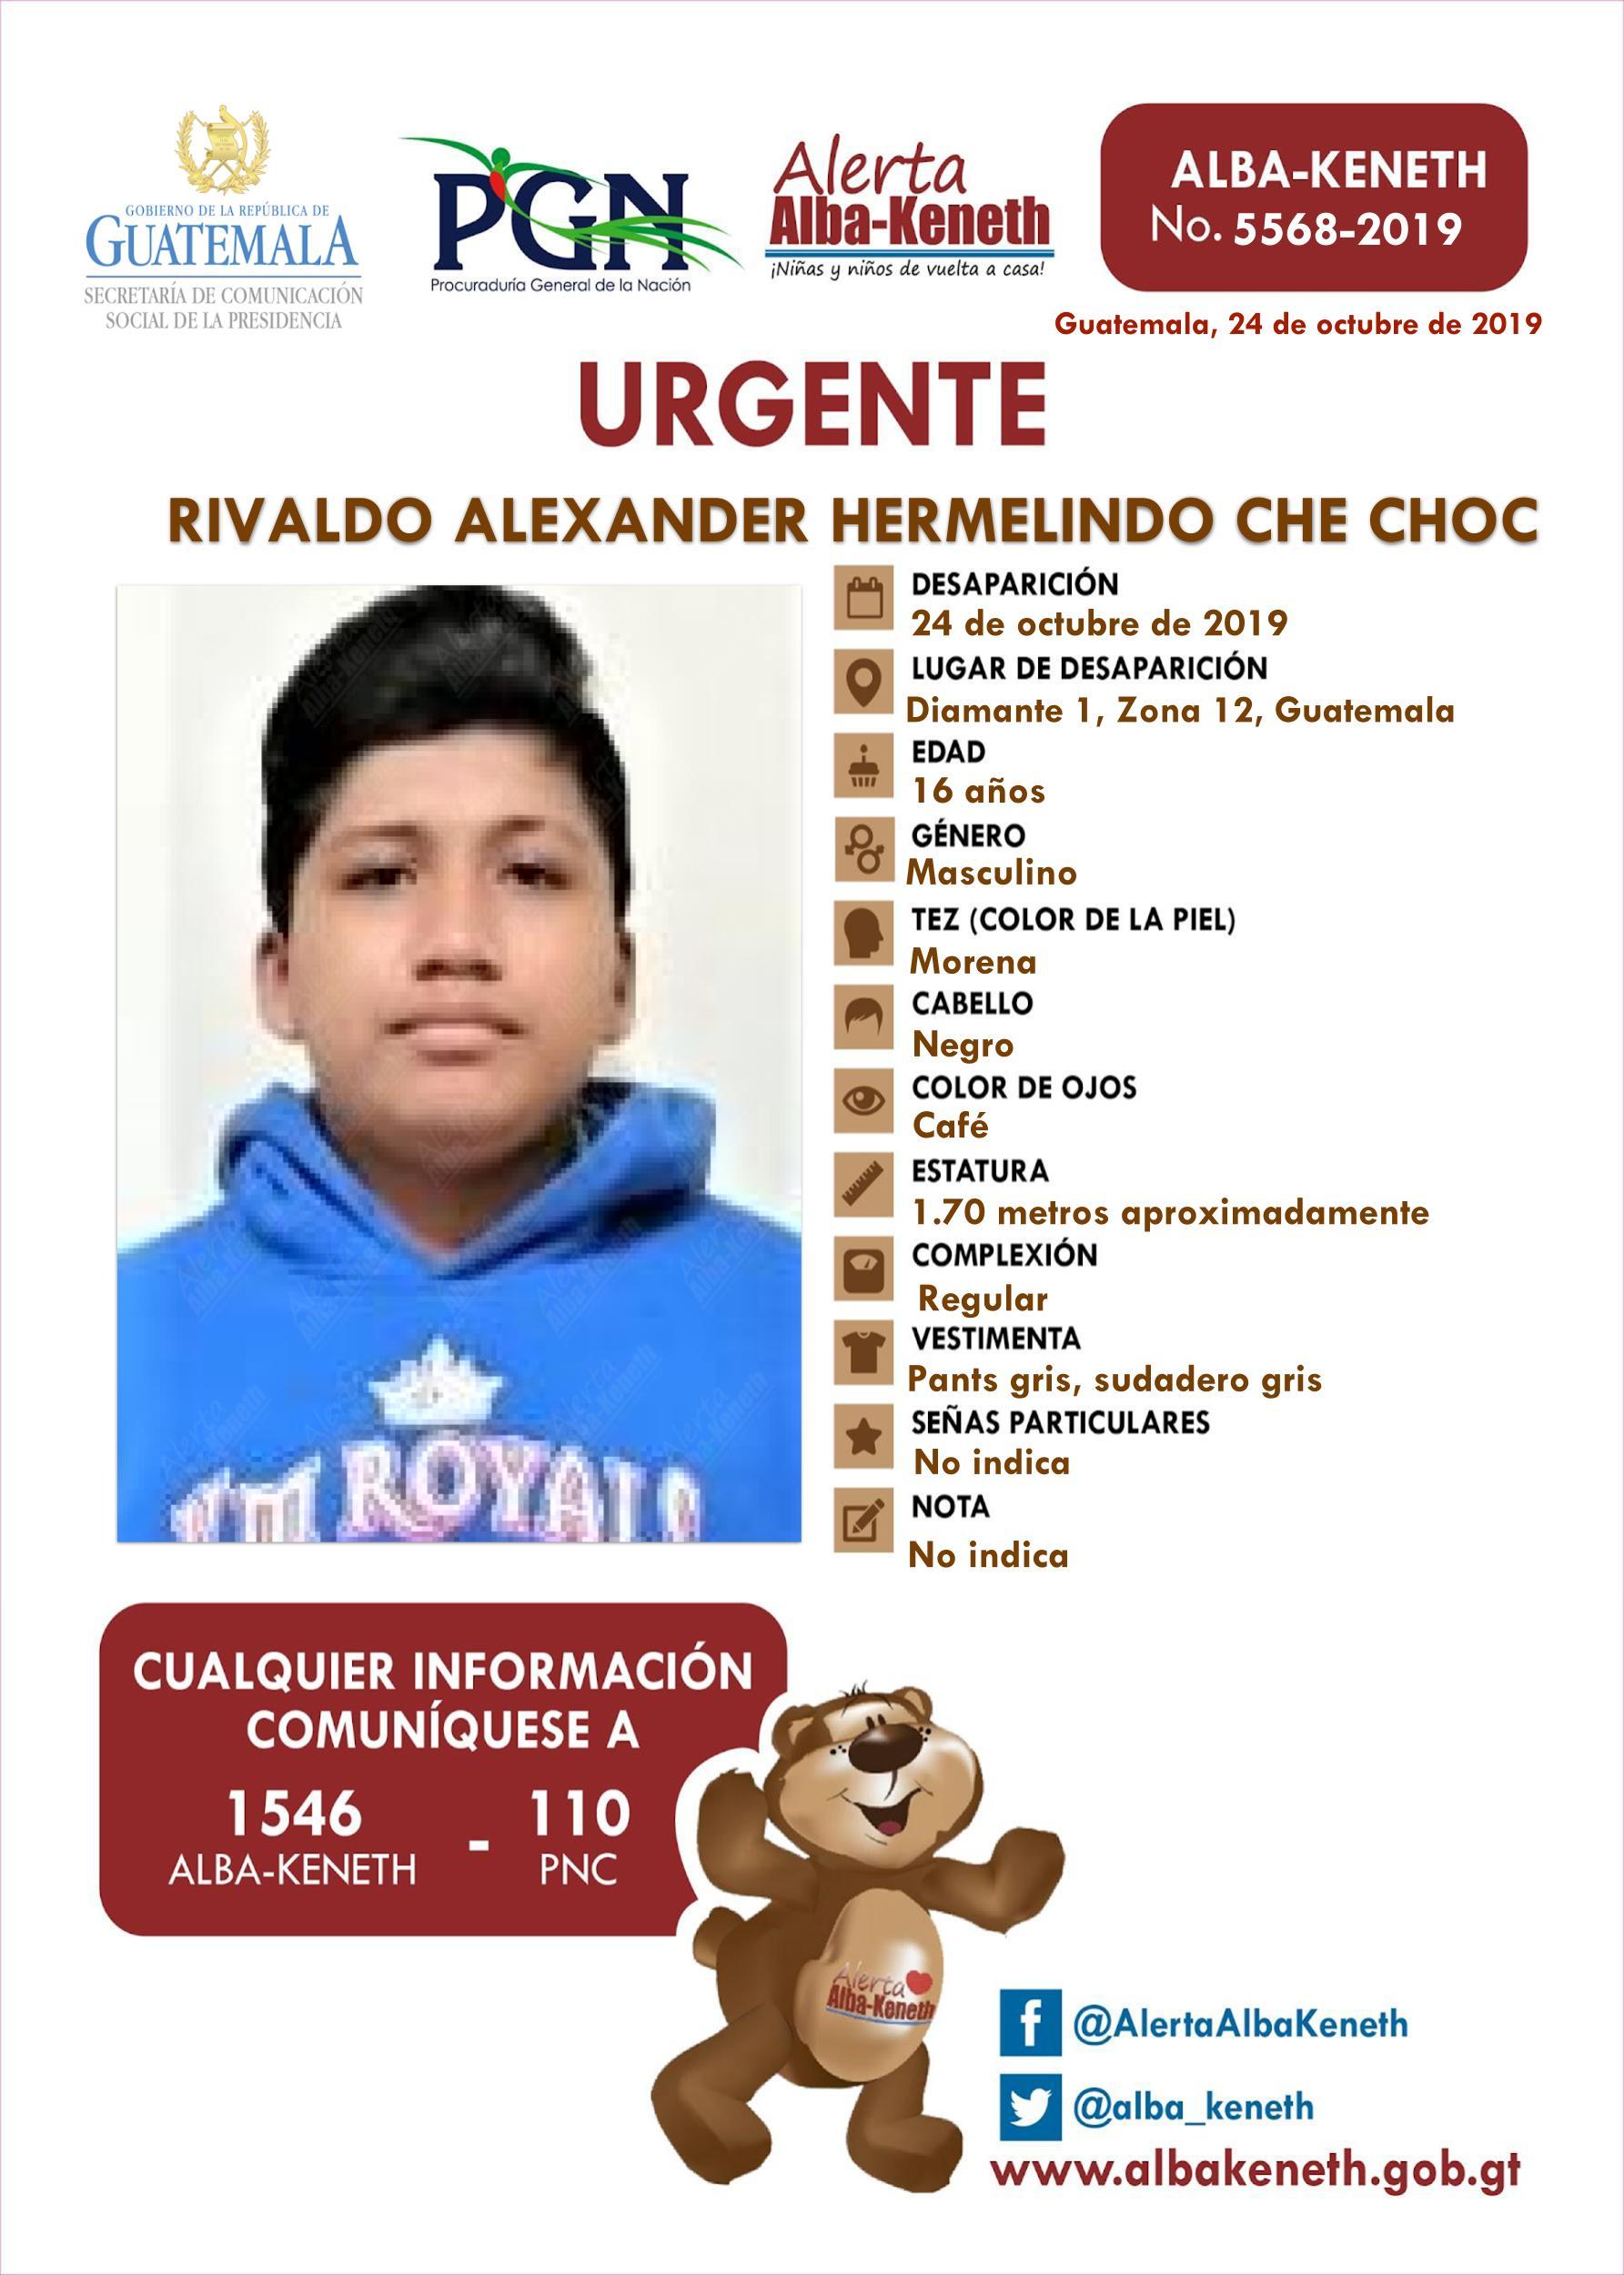 Rivaldo Alexander Hermelindo Che Choc